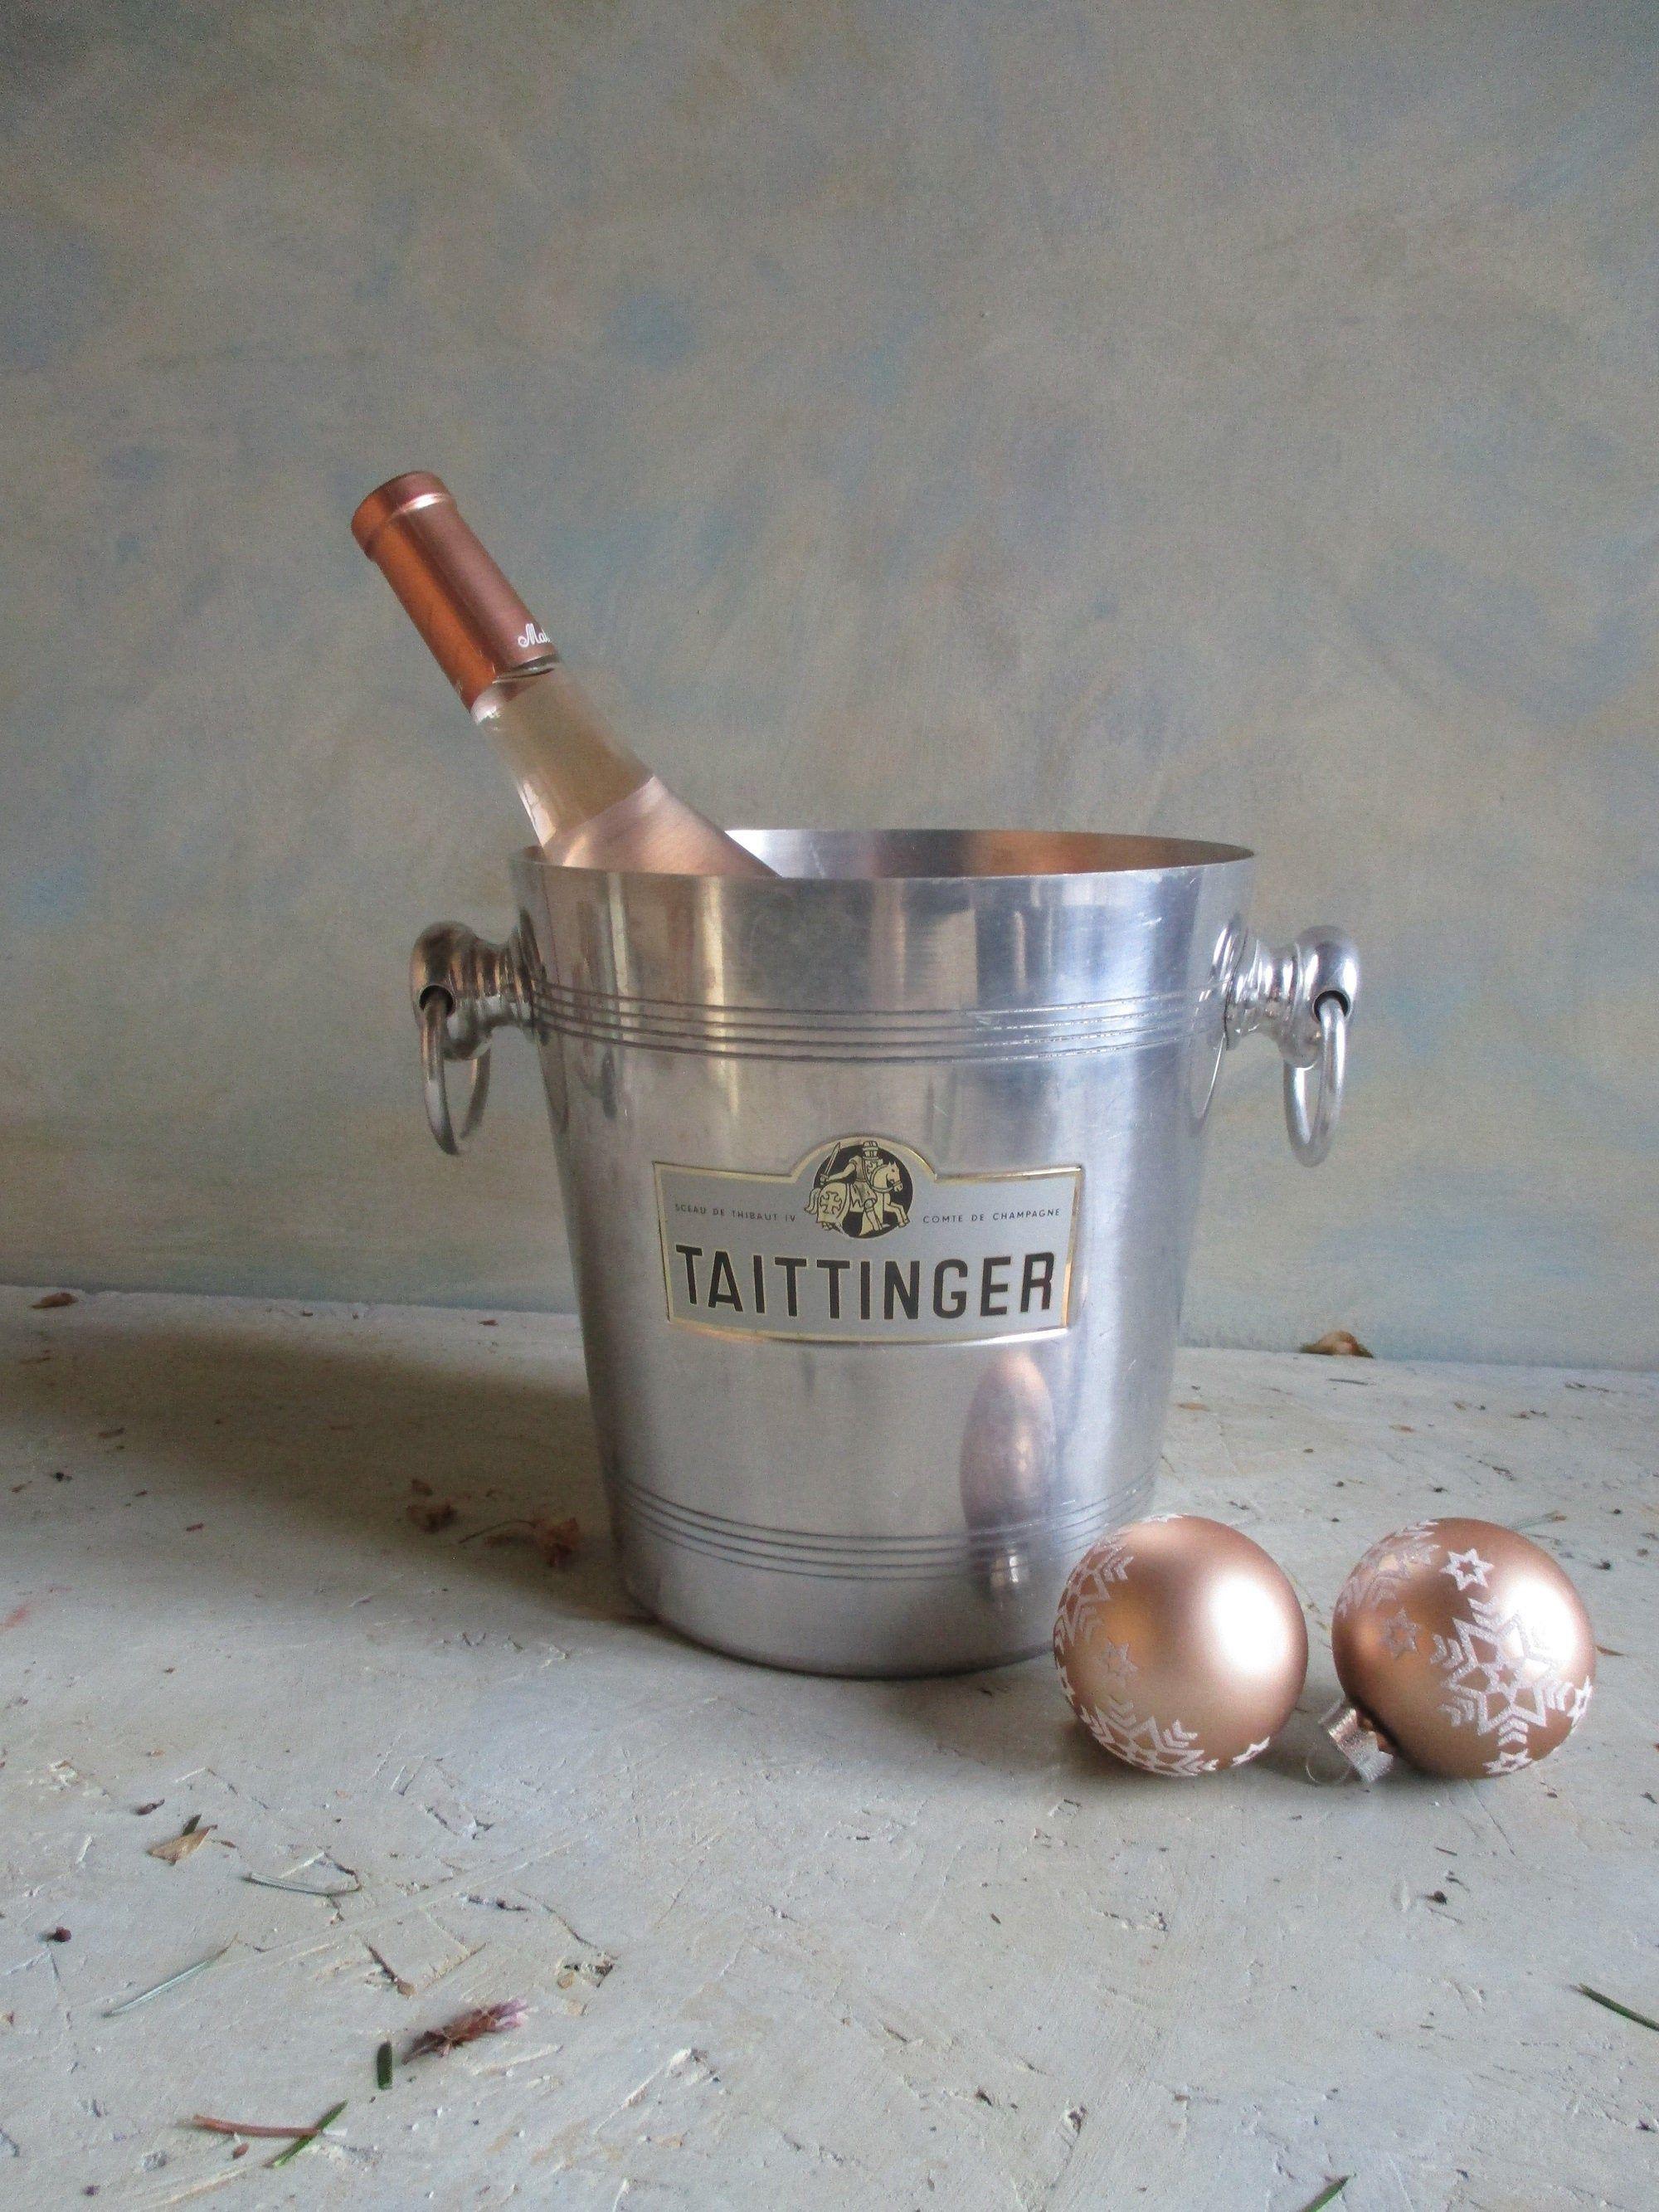 Champagne Bucket Taittinger Champagne Bottle Cooler Wine Cooler French Vintage Champagne Cooler Vintage Wine Bucket Christmas Decor Taittinger Champagne Champagne Cooler Vintage Champagne